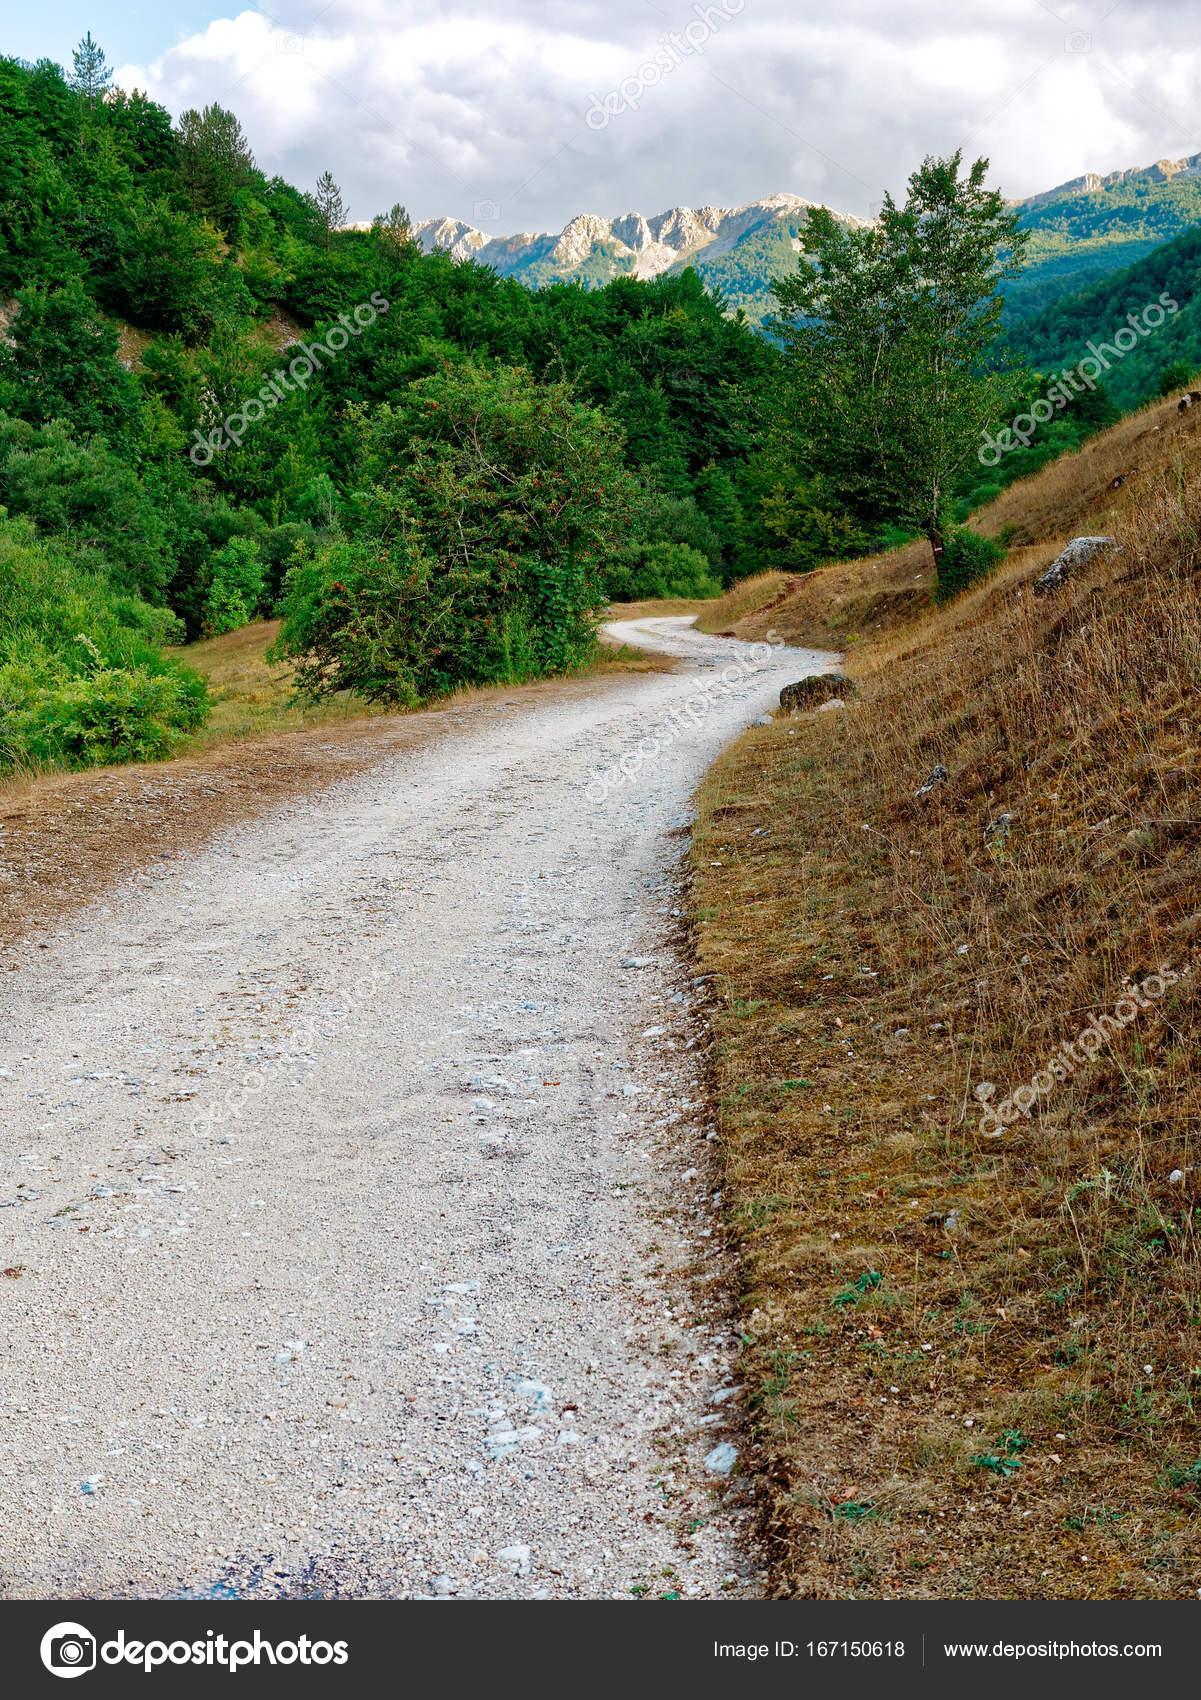 kiesweg in der natur — stockfoto © canbedone #167150618